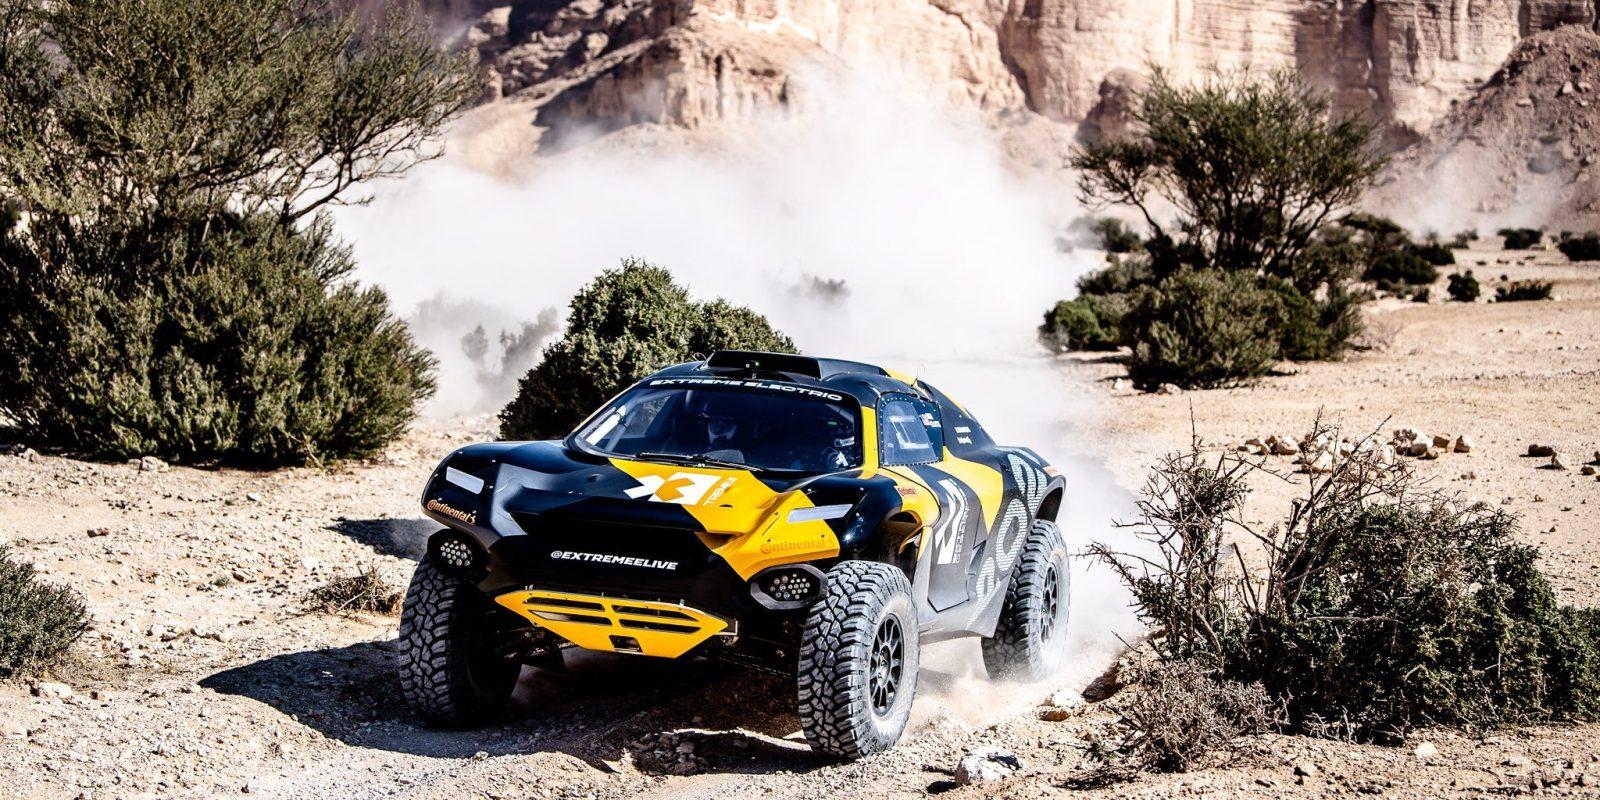 Watch the Extreme E electric rally car conquer Dakar driven by Ken Block